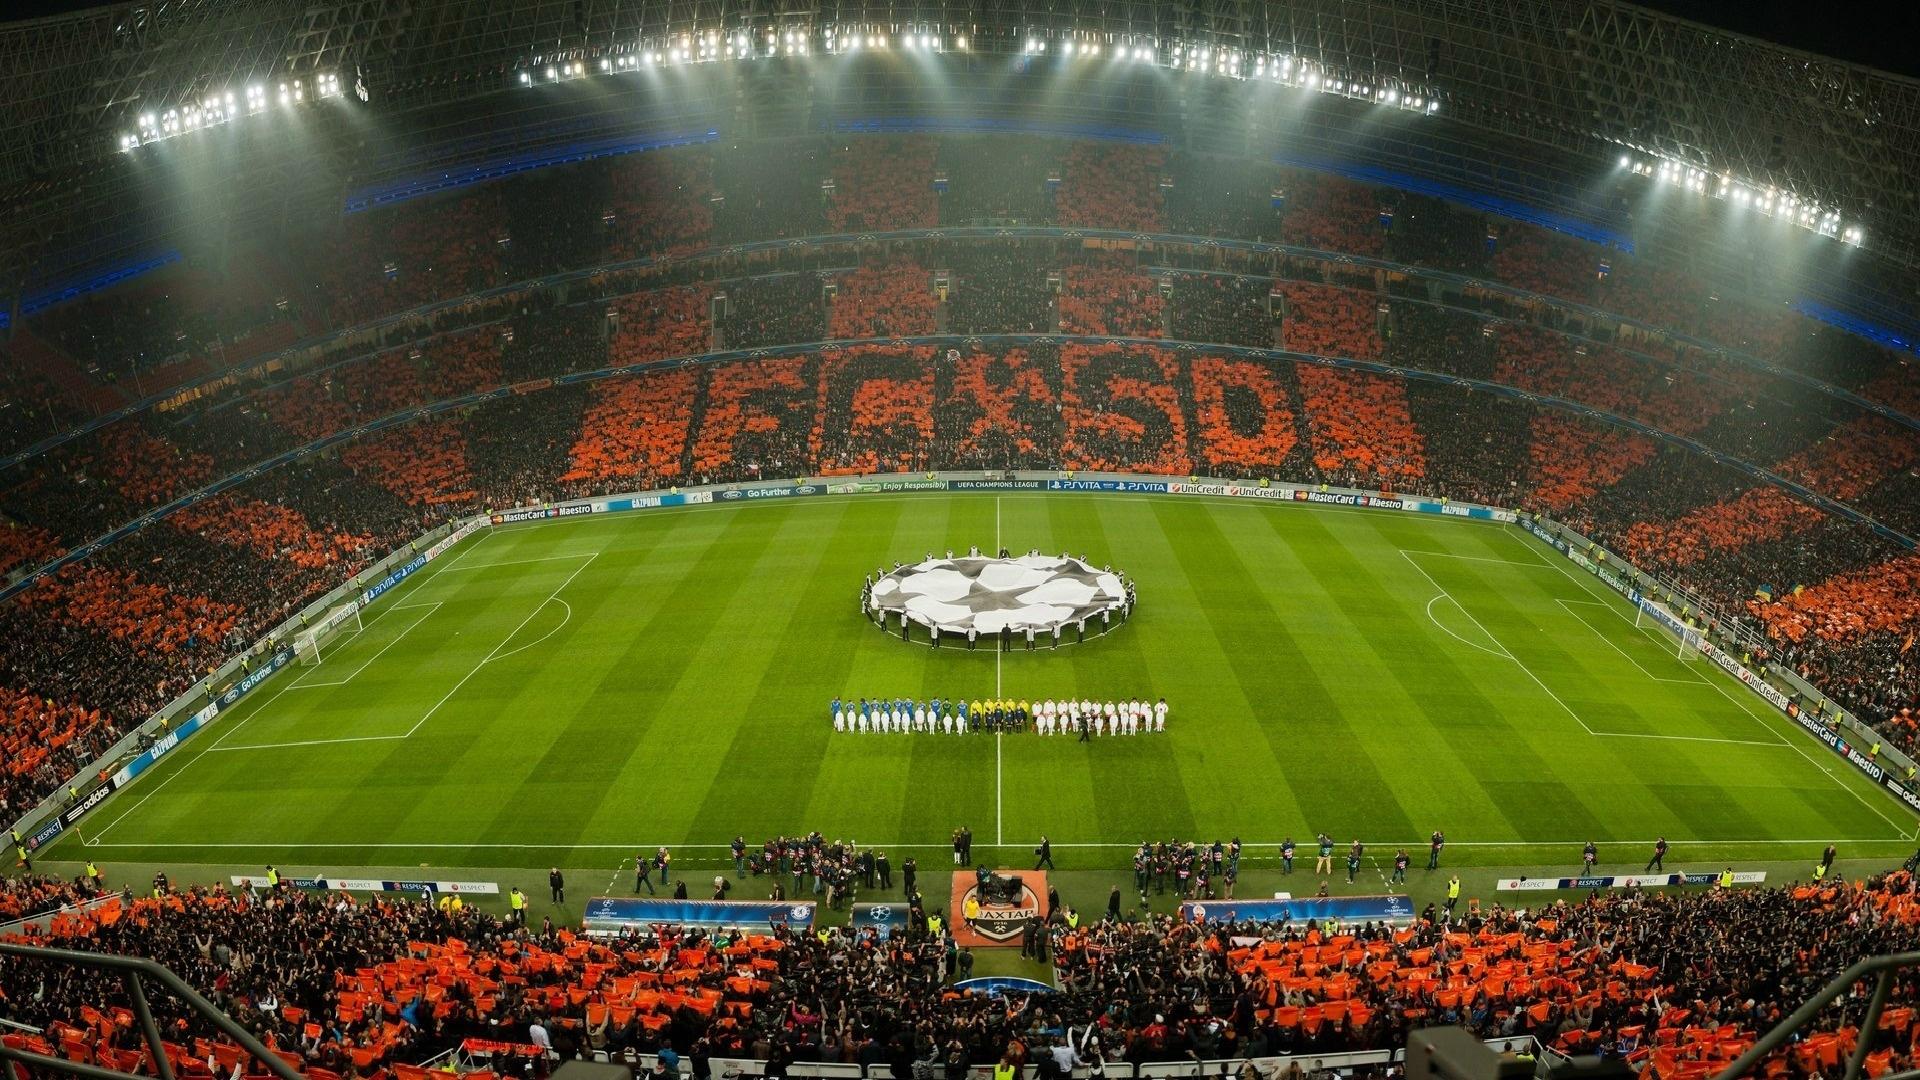 Stadium Soccer Football Sports Qhd Wallpaper 2560x2560: Shakhtar Donetsk, Donbass Arena, Orange Black, Full HD